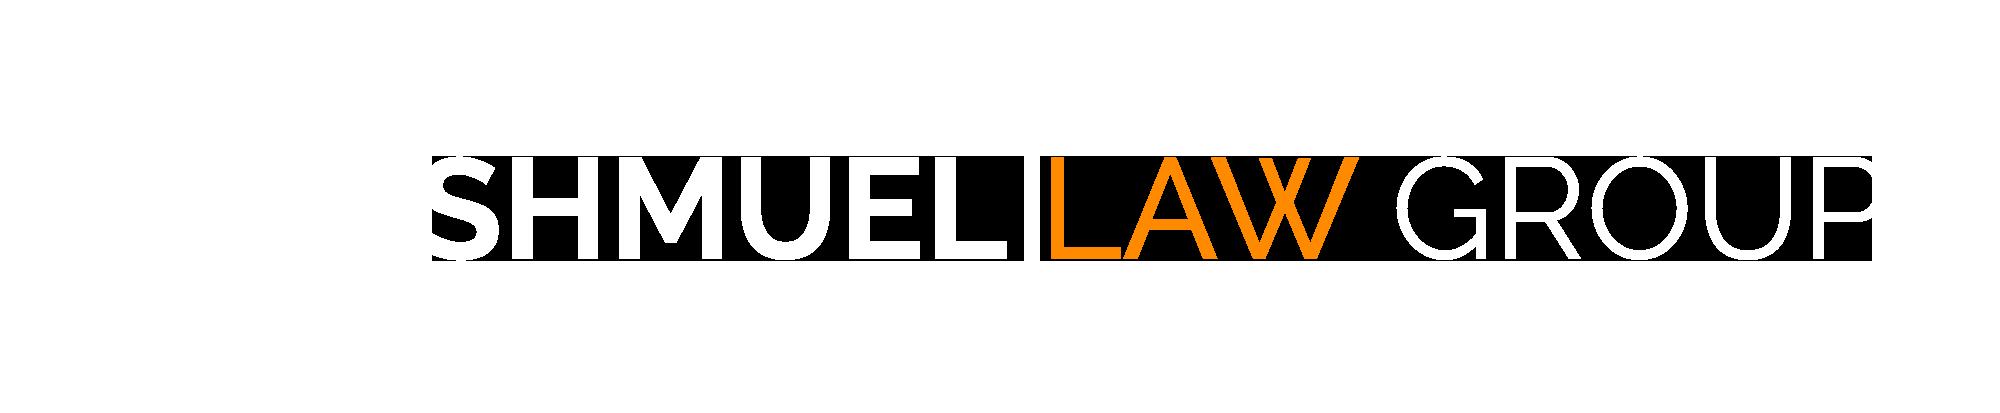 Shmuel Law Group